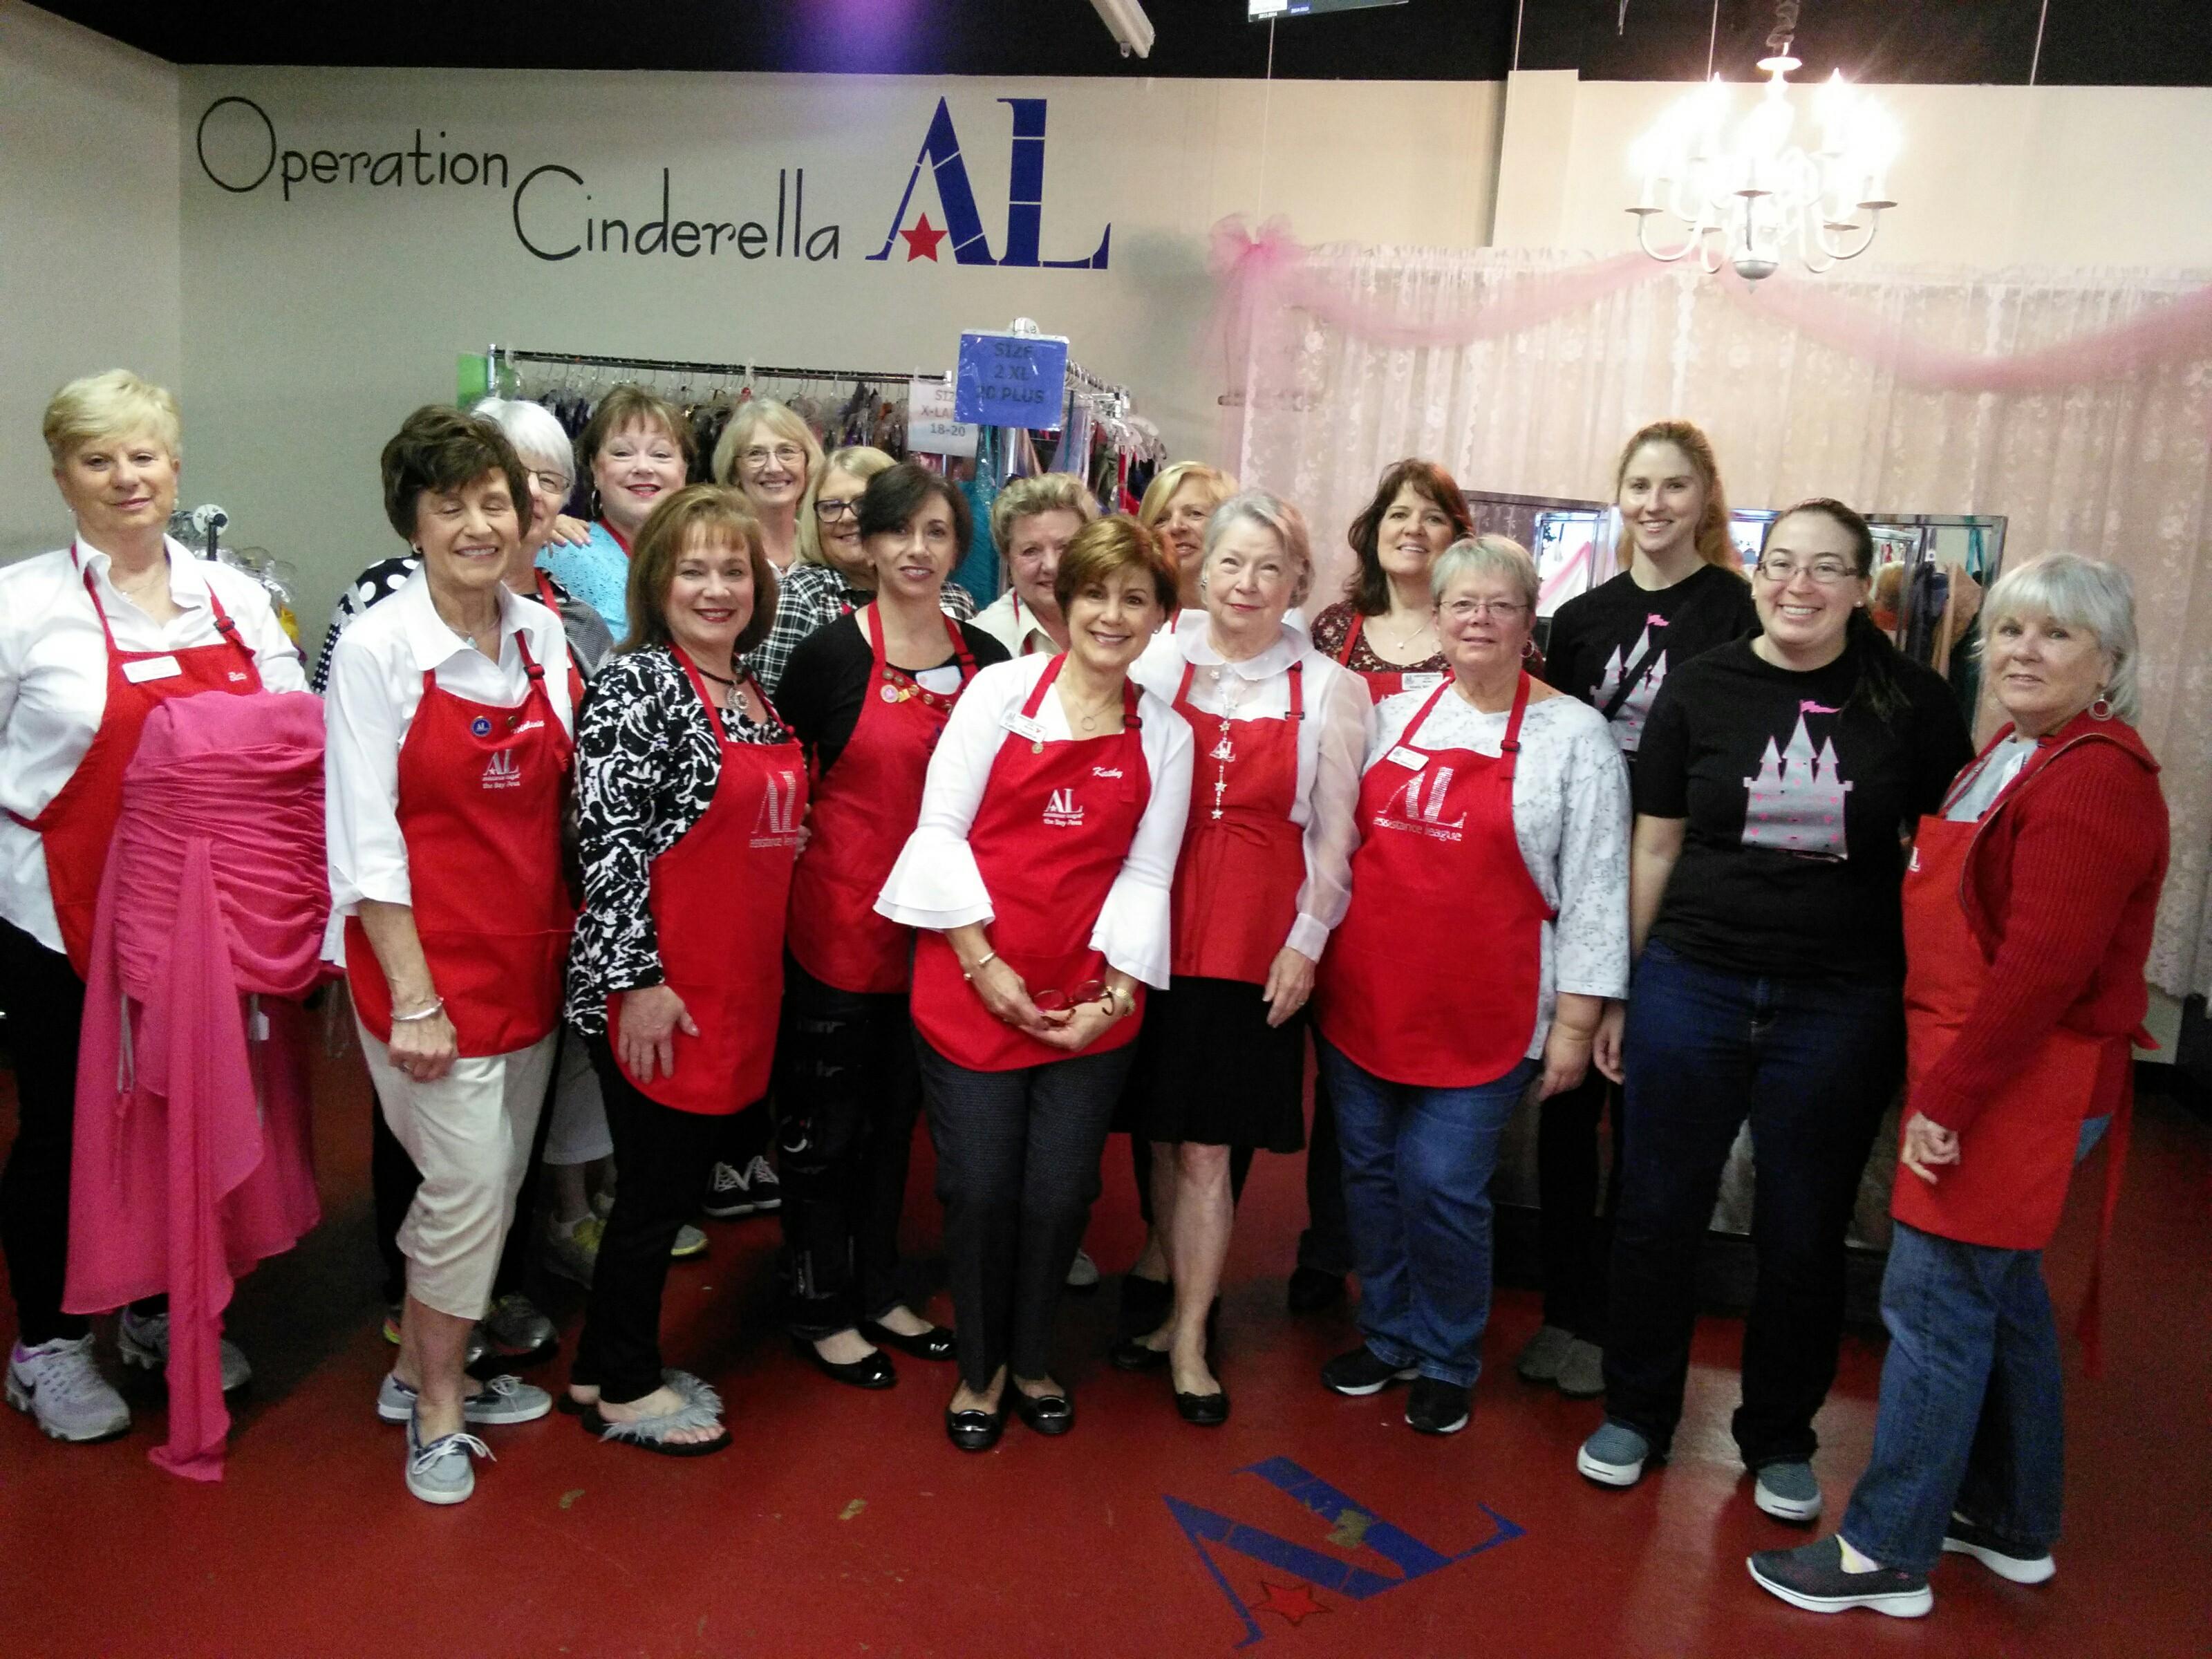 Operation-Cinderella-Volunteers-Boutique-Day-1.AM_